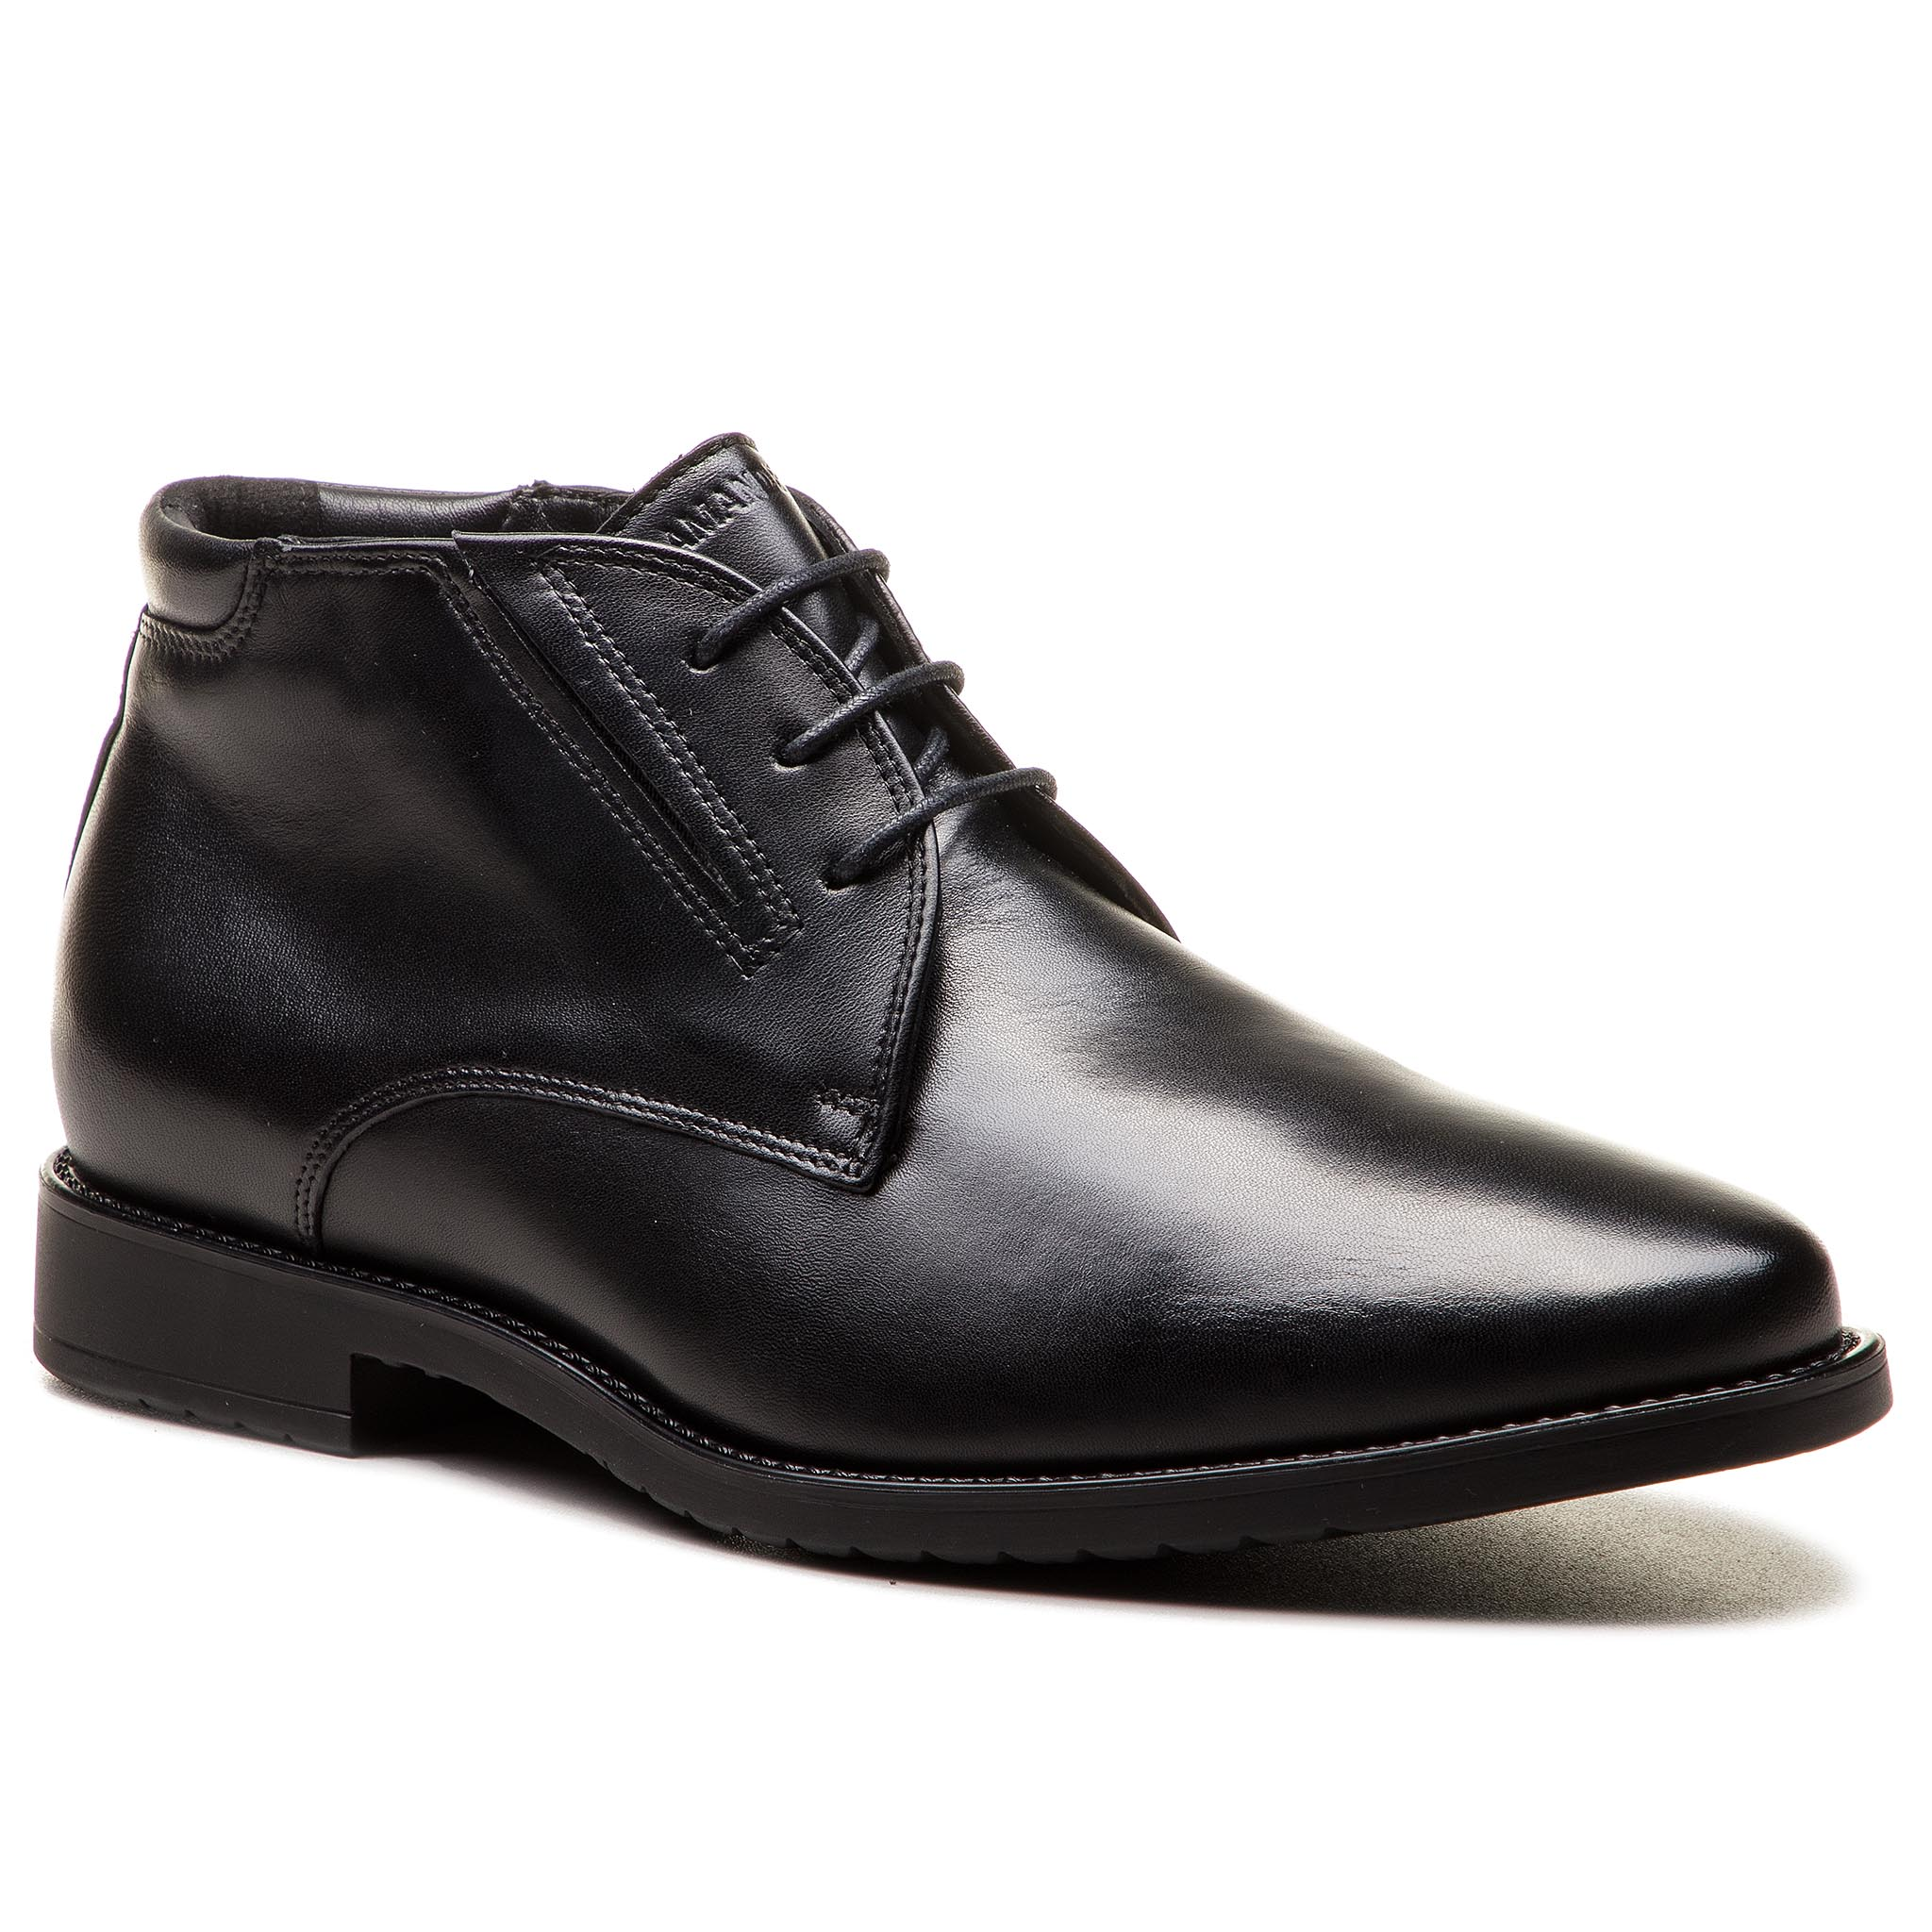 Outdoorová obuv SALAMANDER - Adam 31-69004-61 Black